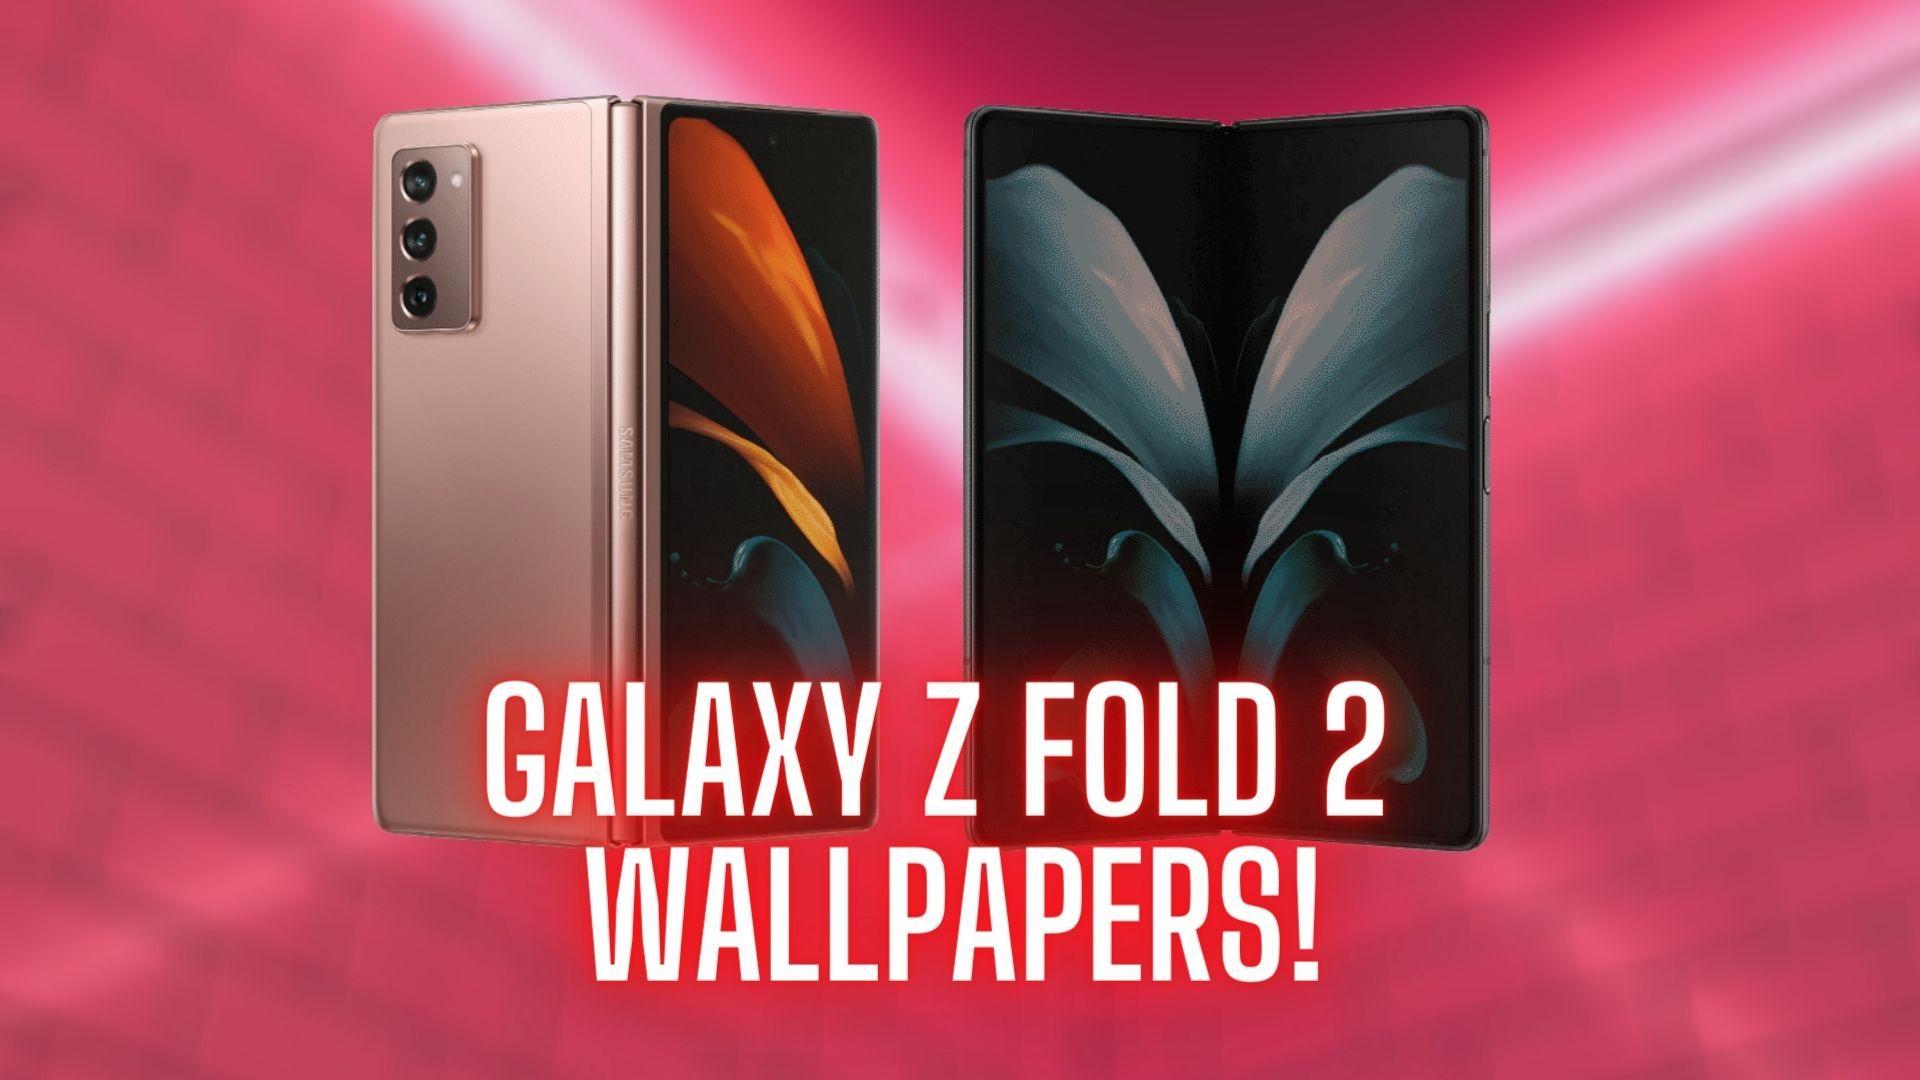 Samsung Galaxy Z Fold 2 Wallpaper Ytechb Exclusive Stock Wallpaper Samsung Galaxy Wallpaper Samsung Wallpaper